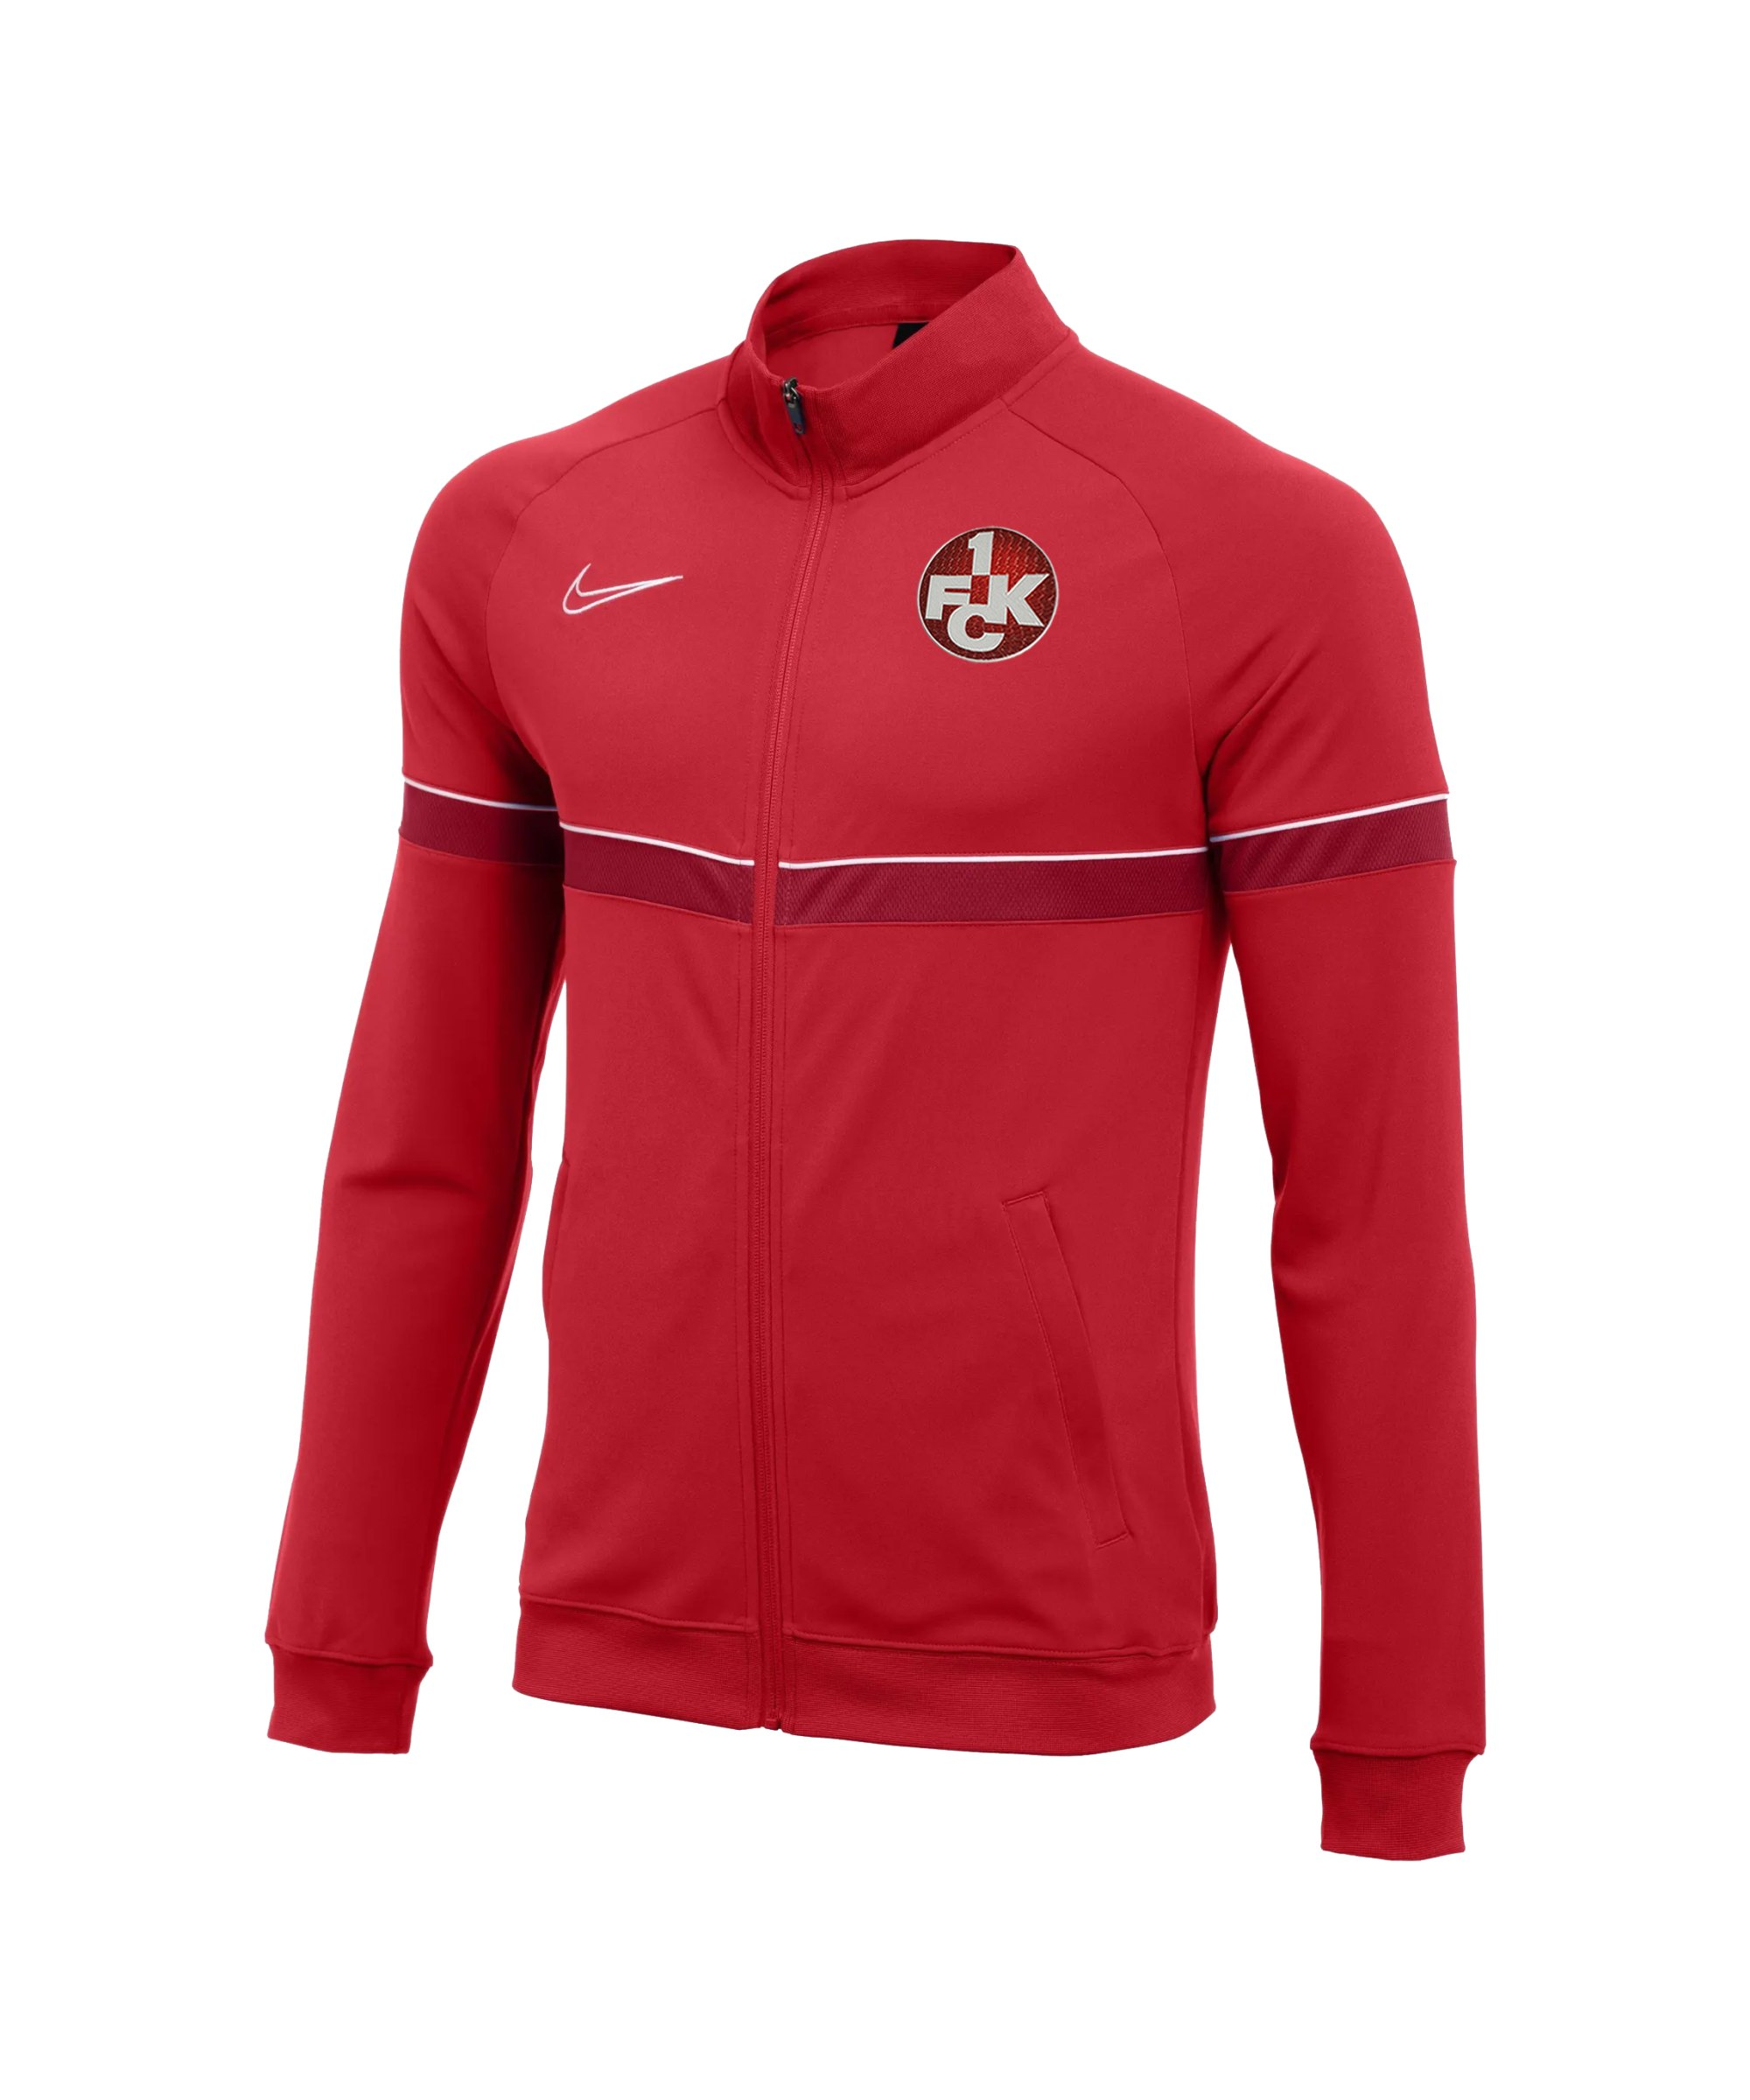 Nike 1. FC Kaiserslautern Trainingsjacke Kids F657 - rot